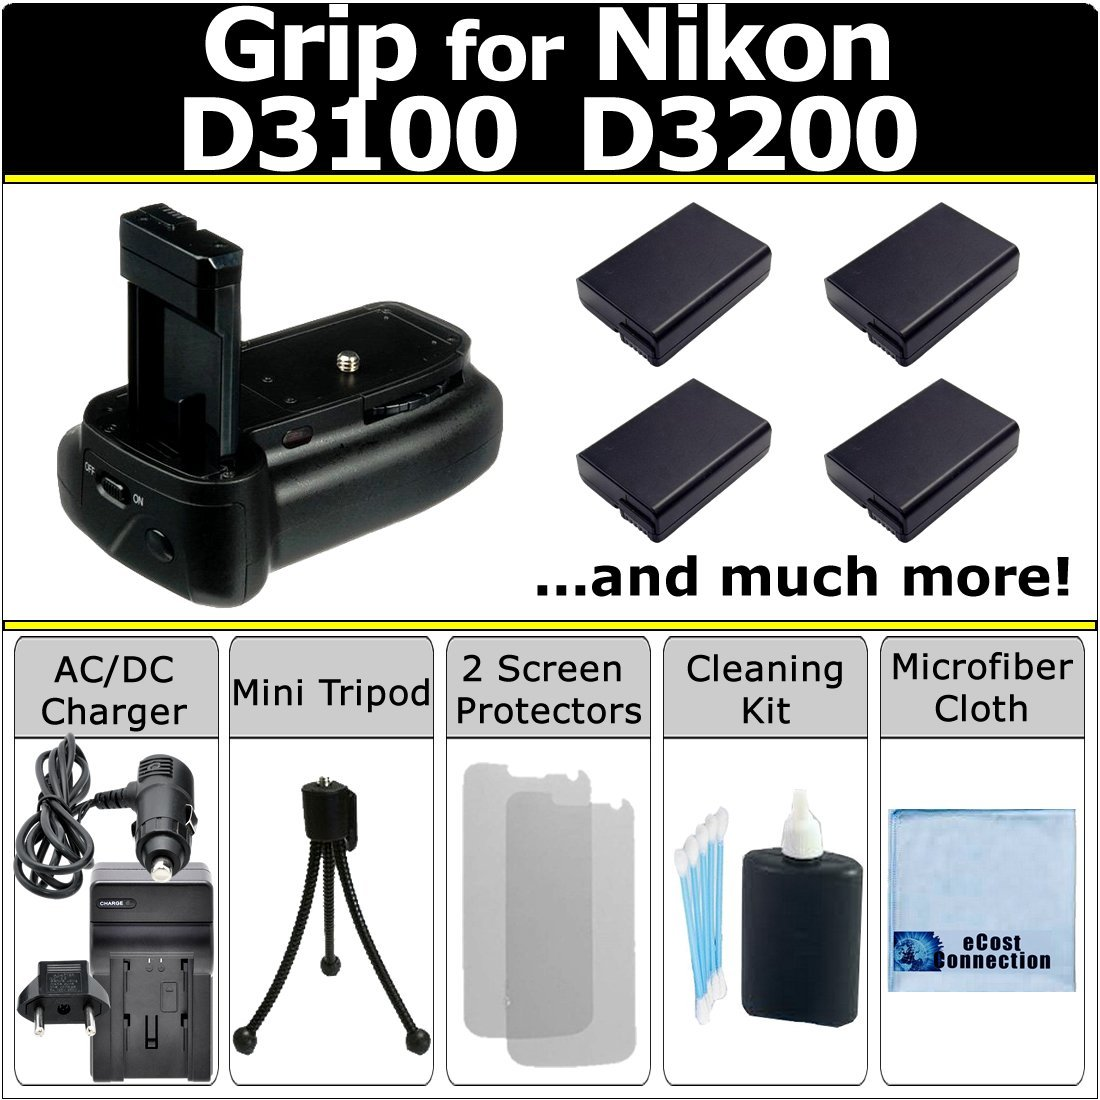 Professional Vertical D3100 D3200 Multi Purpose Battery Grip for Nikon D3100 D3200 DSLR Camera + 4 EN-EL14 Long Life Batteries + AC/DC Turbo Charger with Travel Adapter + Complete Deluxe Starter Kit (BG-N9 BGN9)